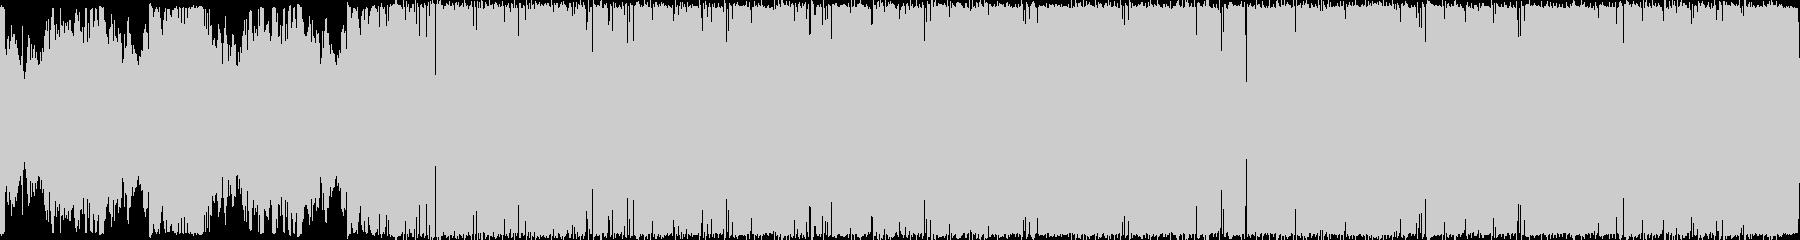 SFをイメージした曲です。の未再生の波形